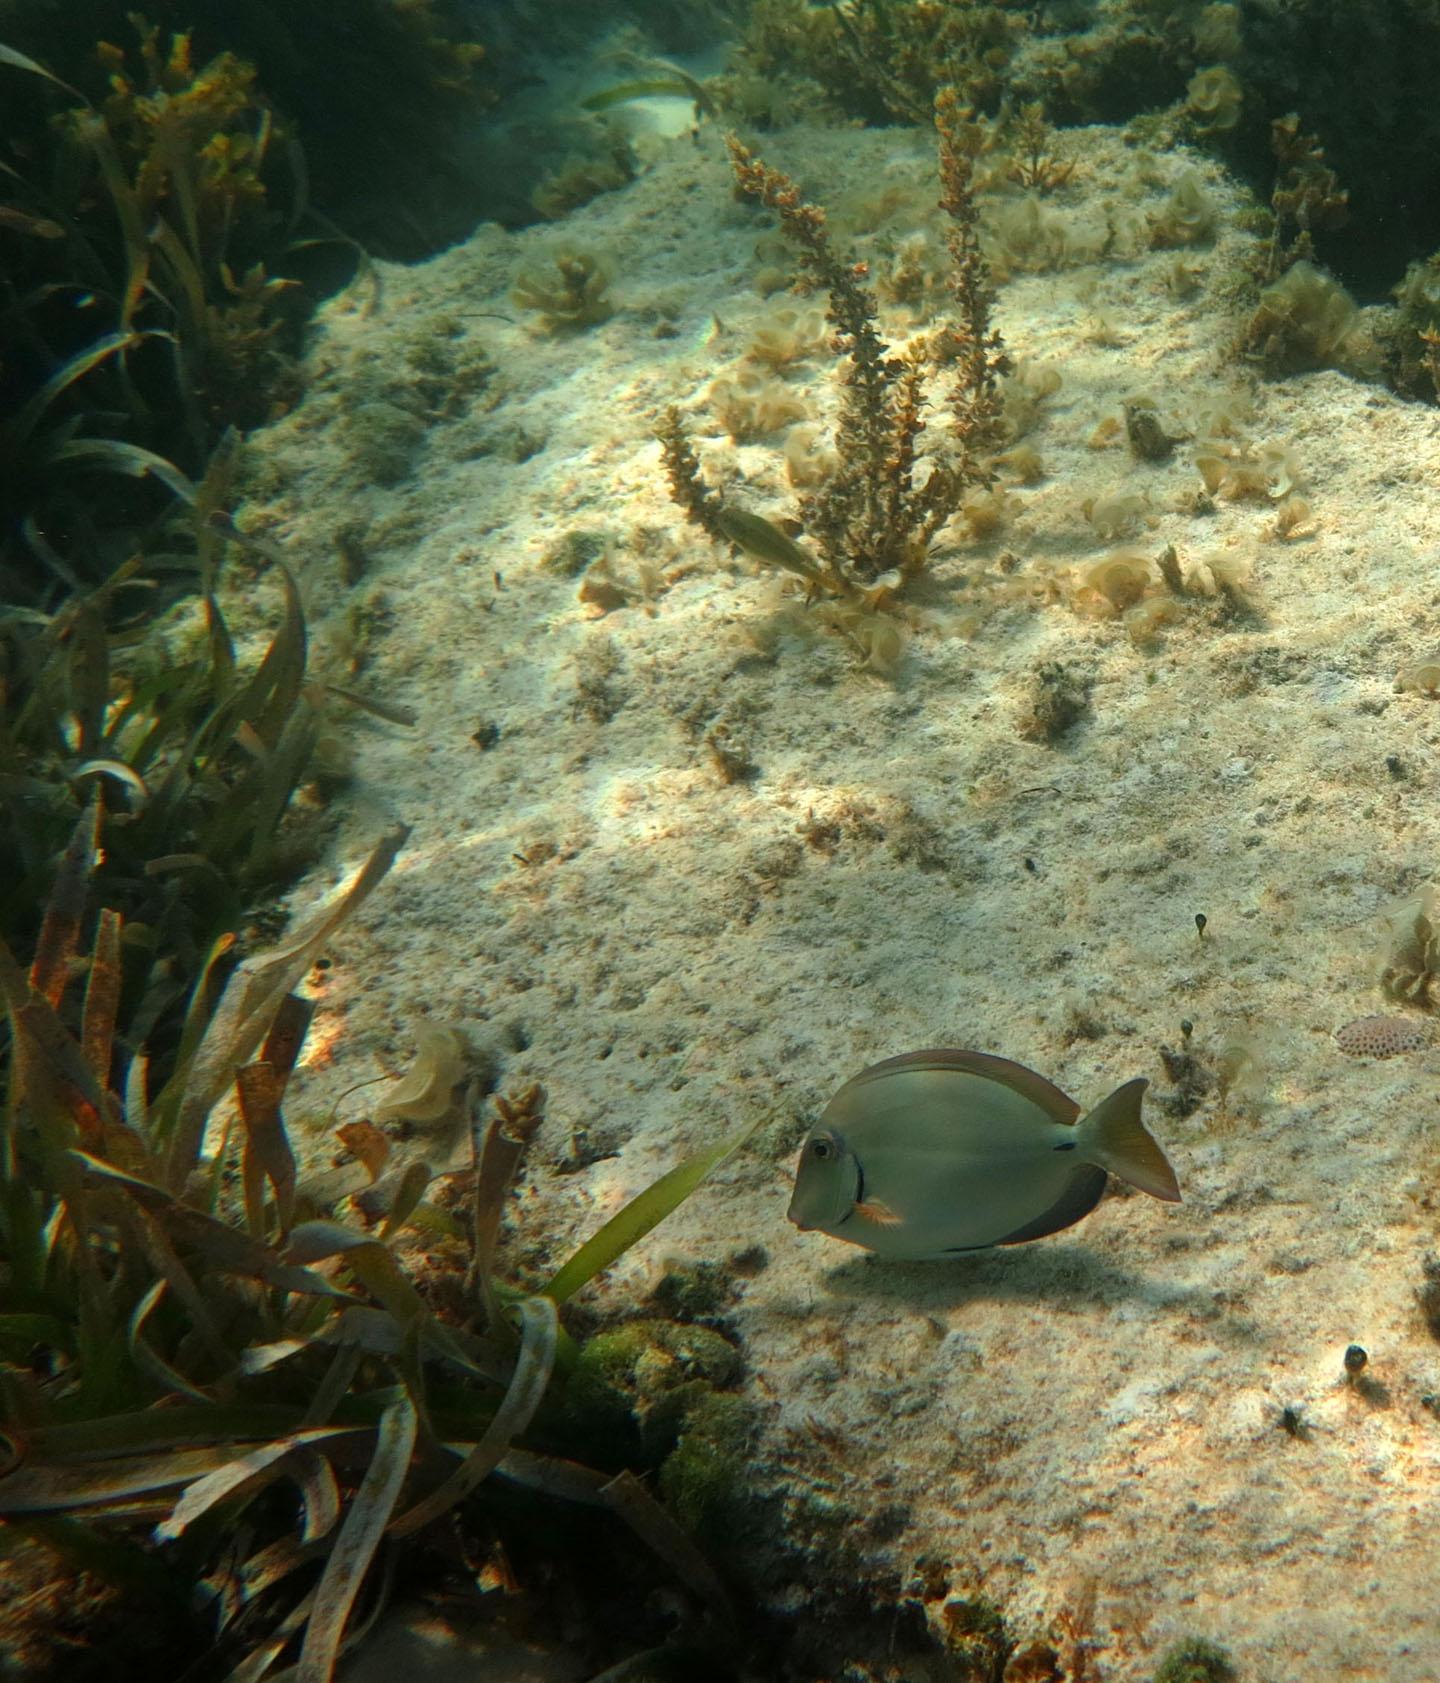 bahamas, abaco, green turtle cay, snorkeling, fish